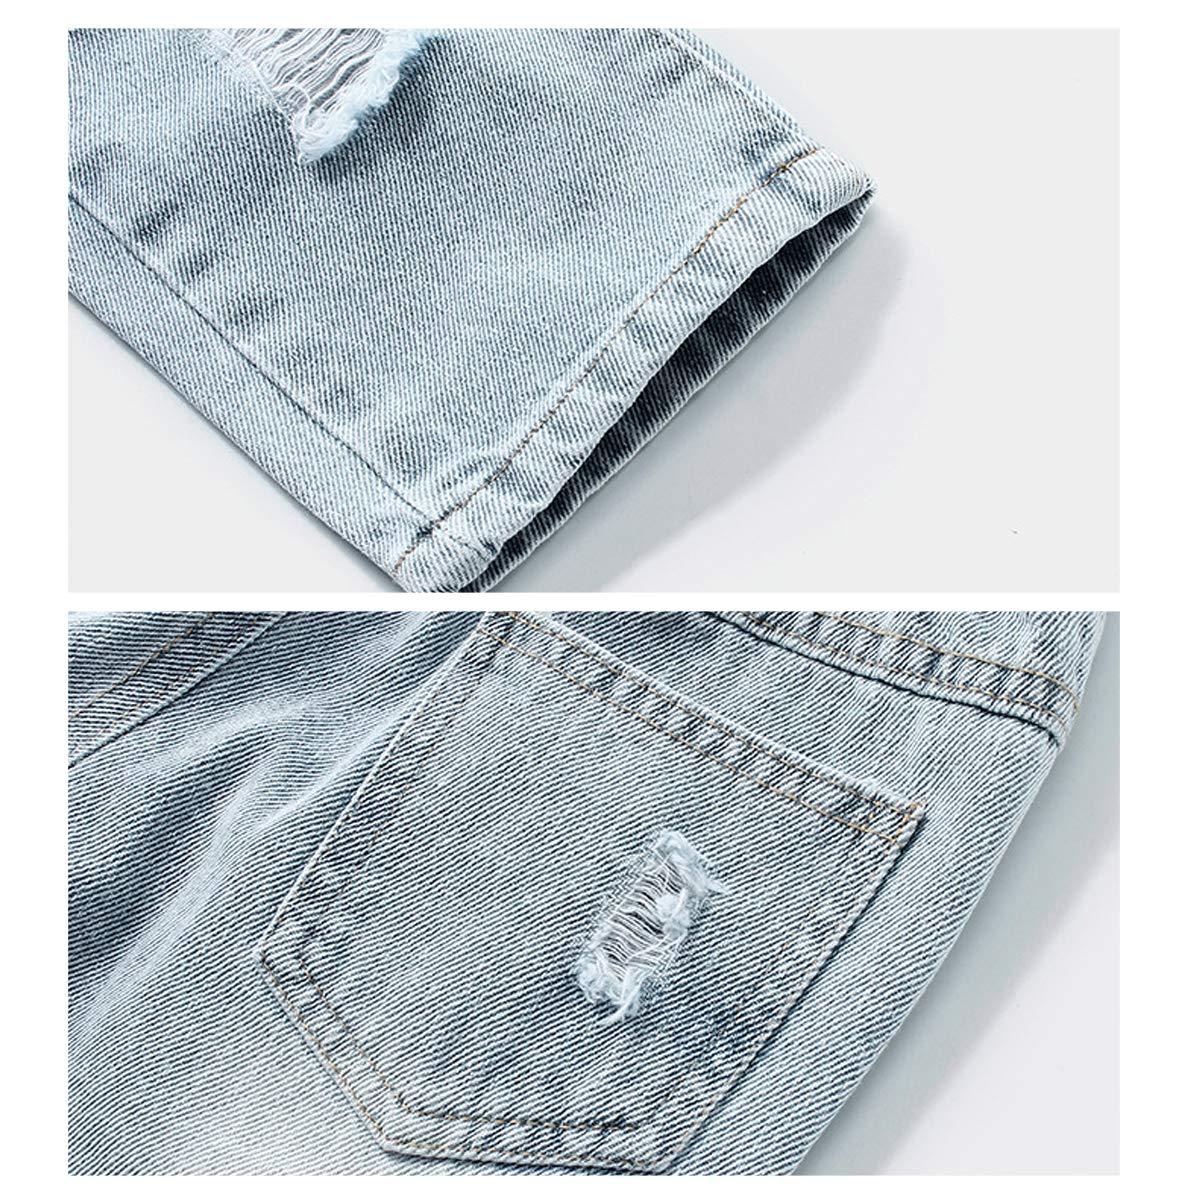 LAPLBEKE Bambino Jeans Bimbo Ragazzi Denim Strappati Pantaloni Stretch Pantalone Primavera Autunno Casual